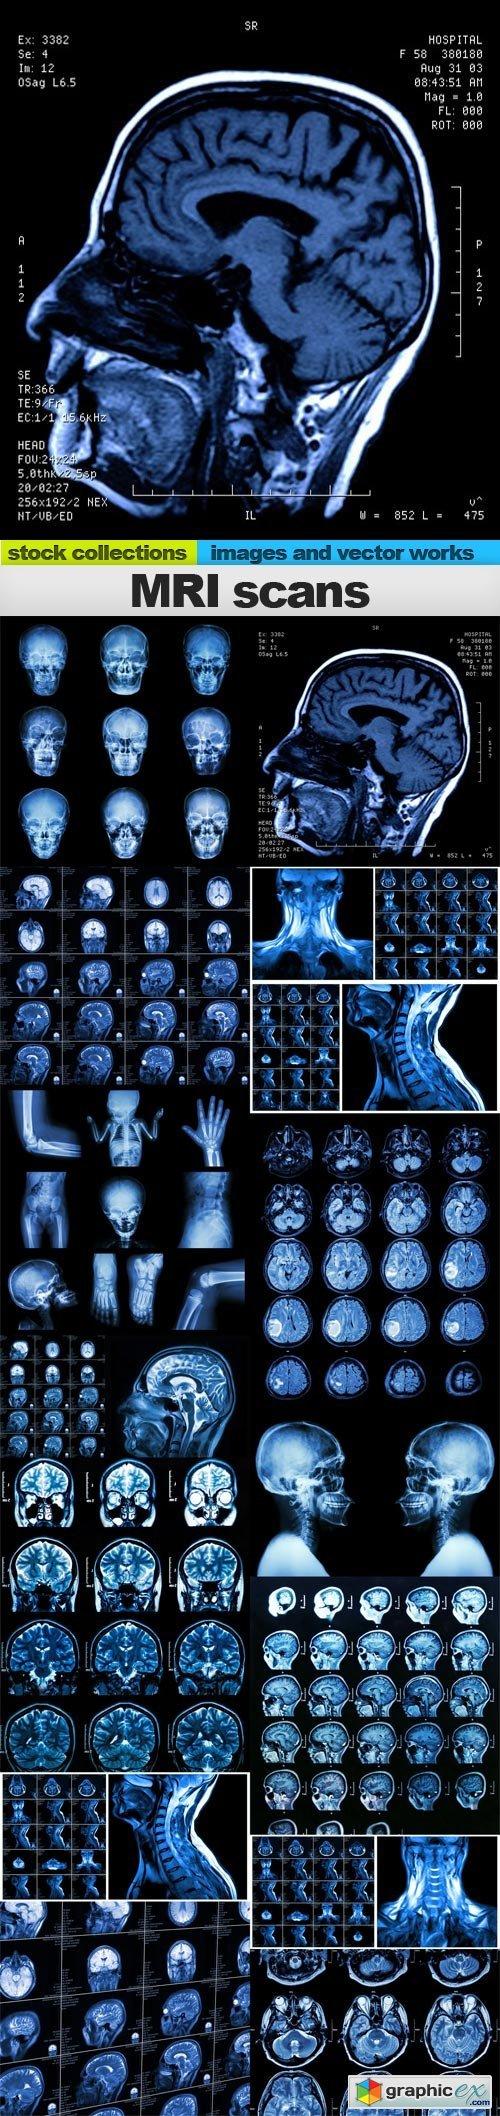 MRI scans, 15 x UHQ JPEG